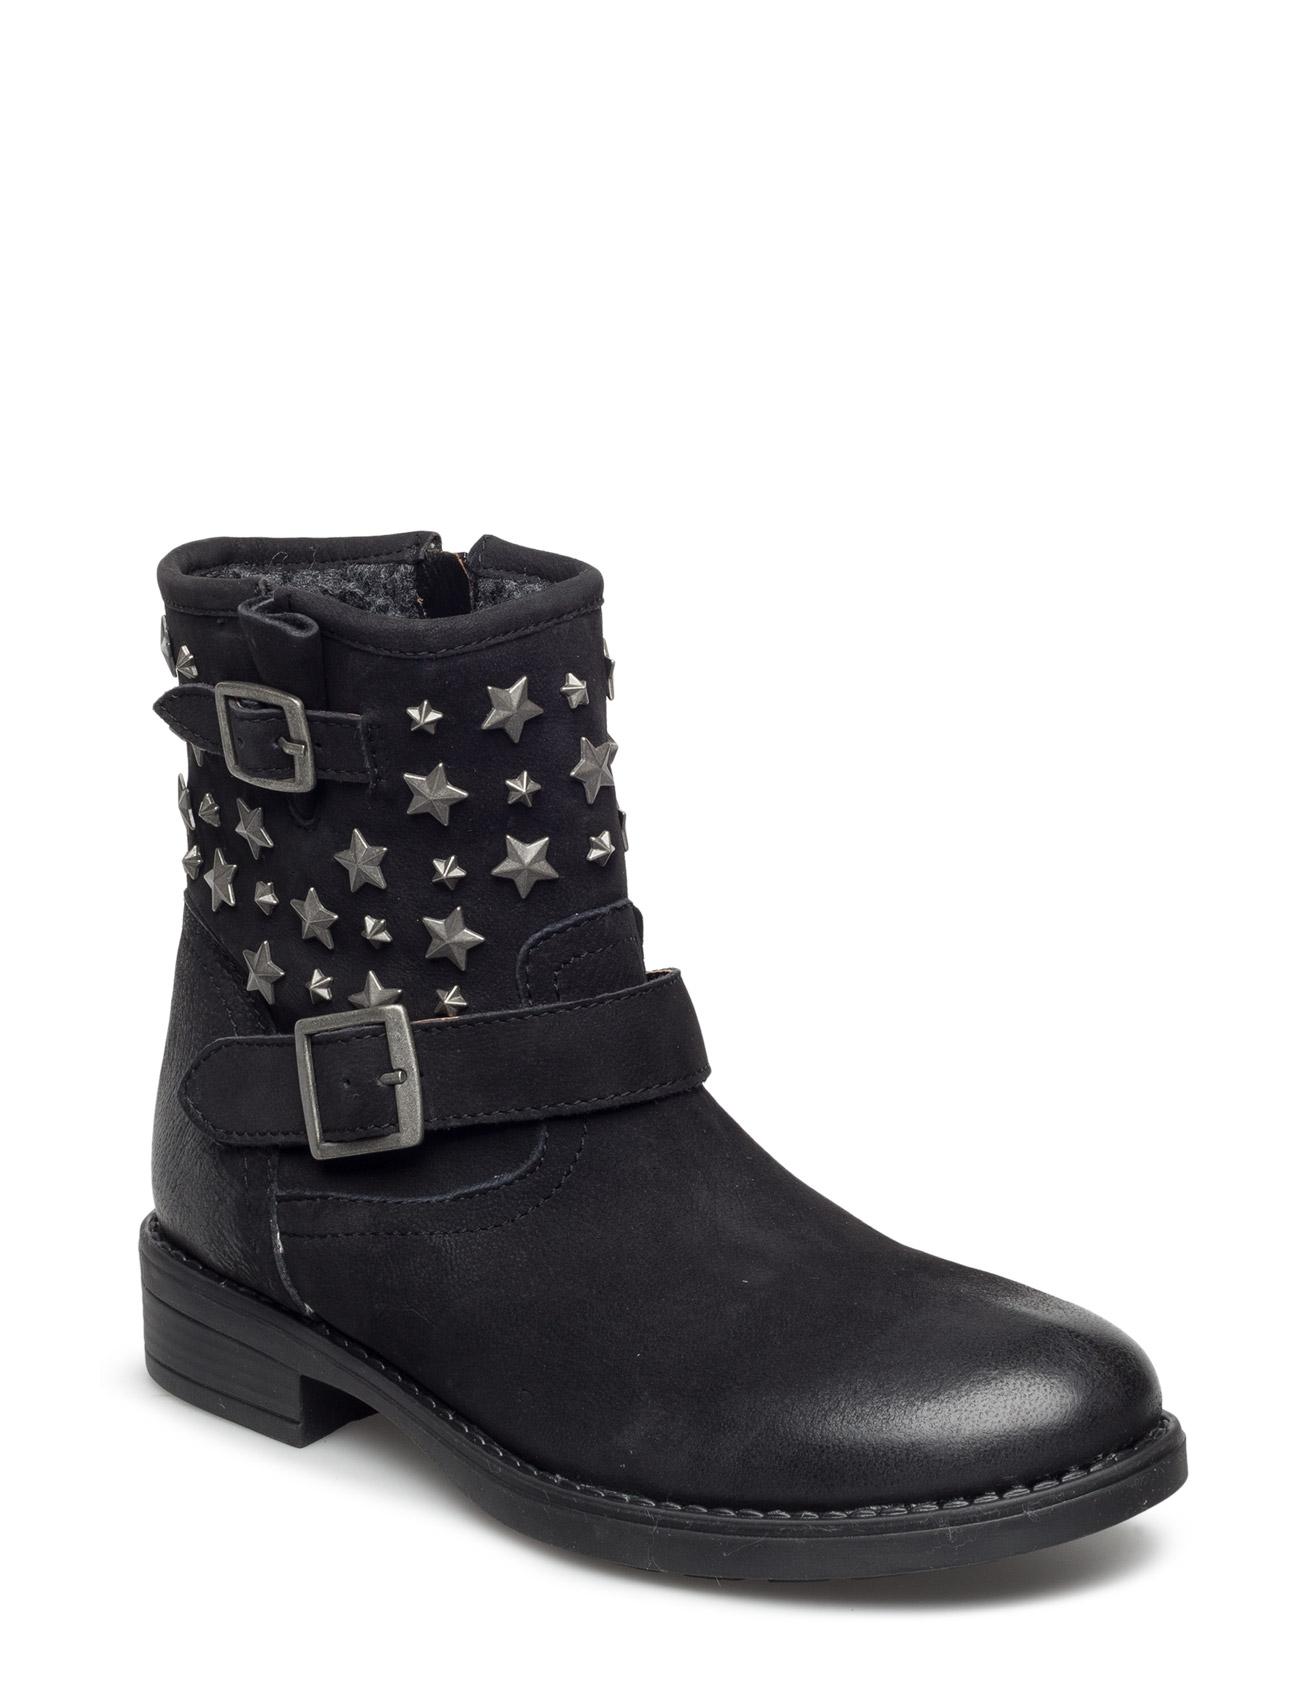 35e0c433881 Boot W. Star Studs Petit by Sofie Schnoor Støvler til Børn i Sort